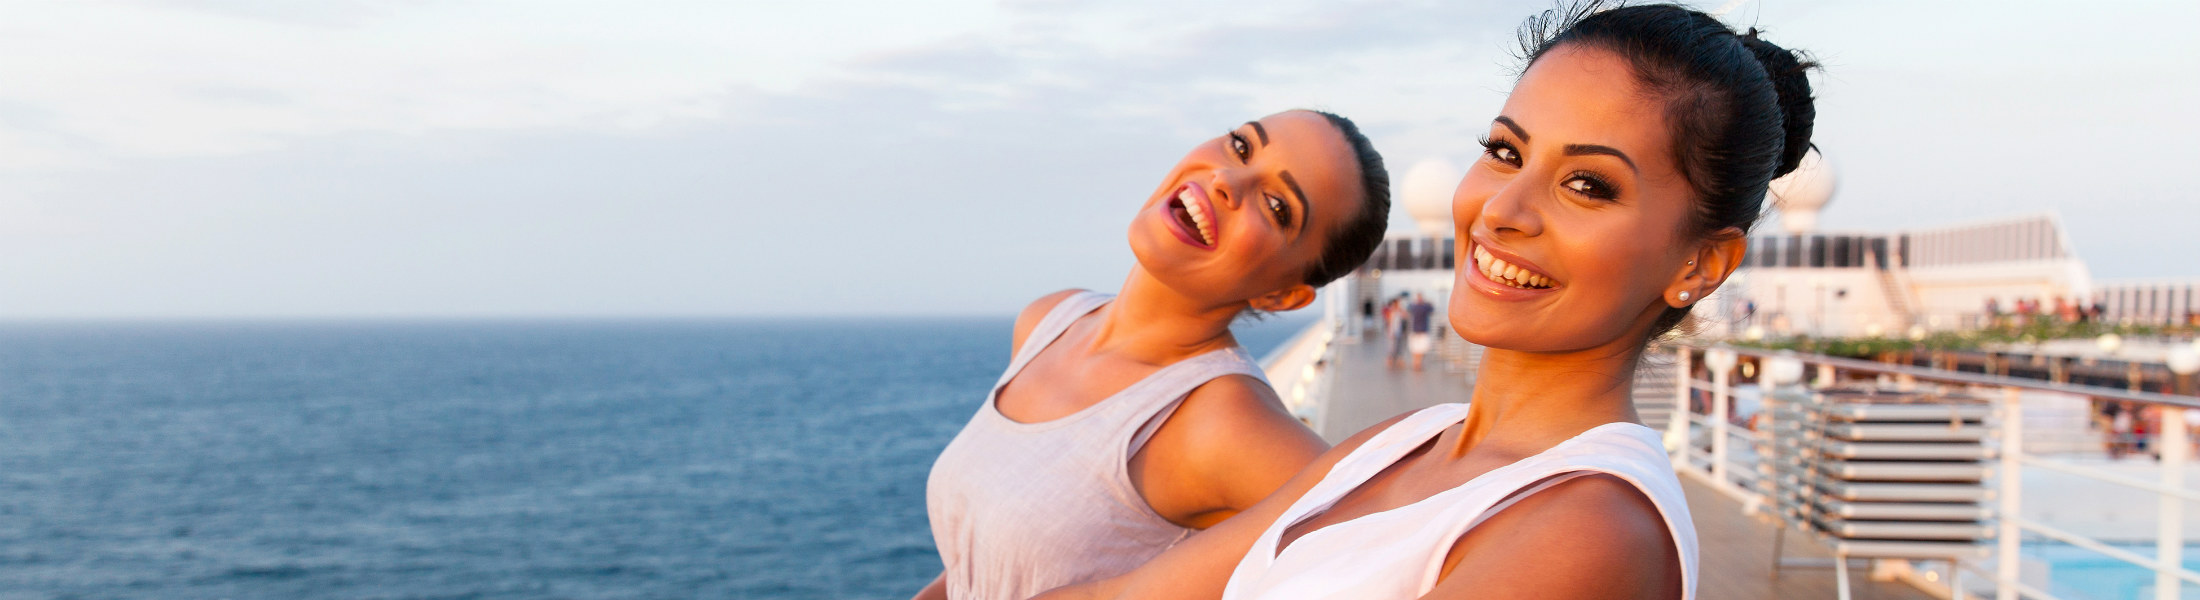 two women having fun on cruise ship